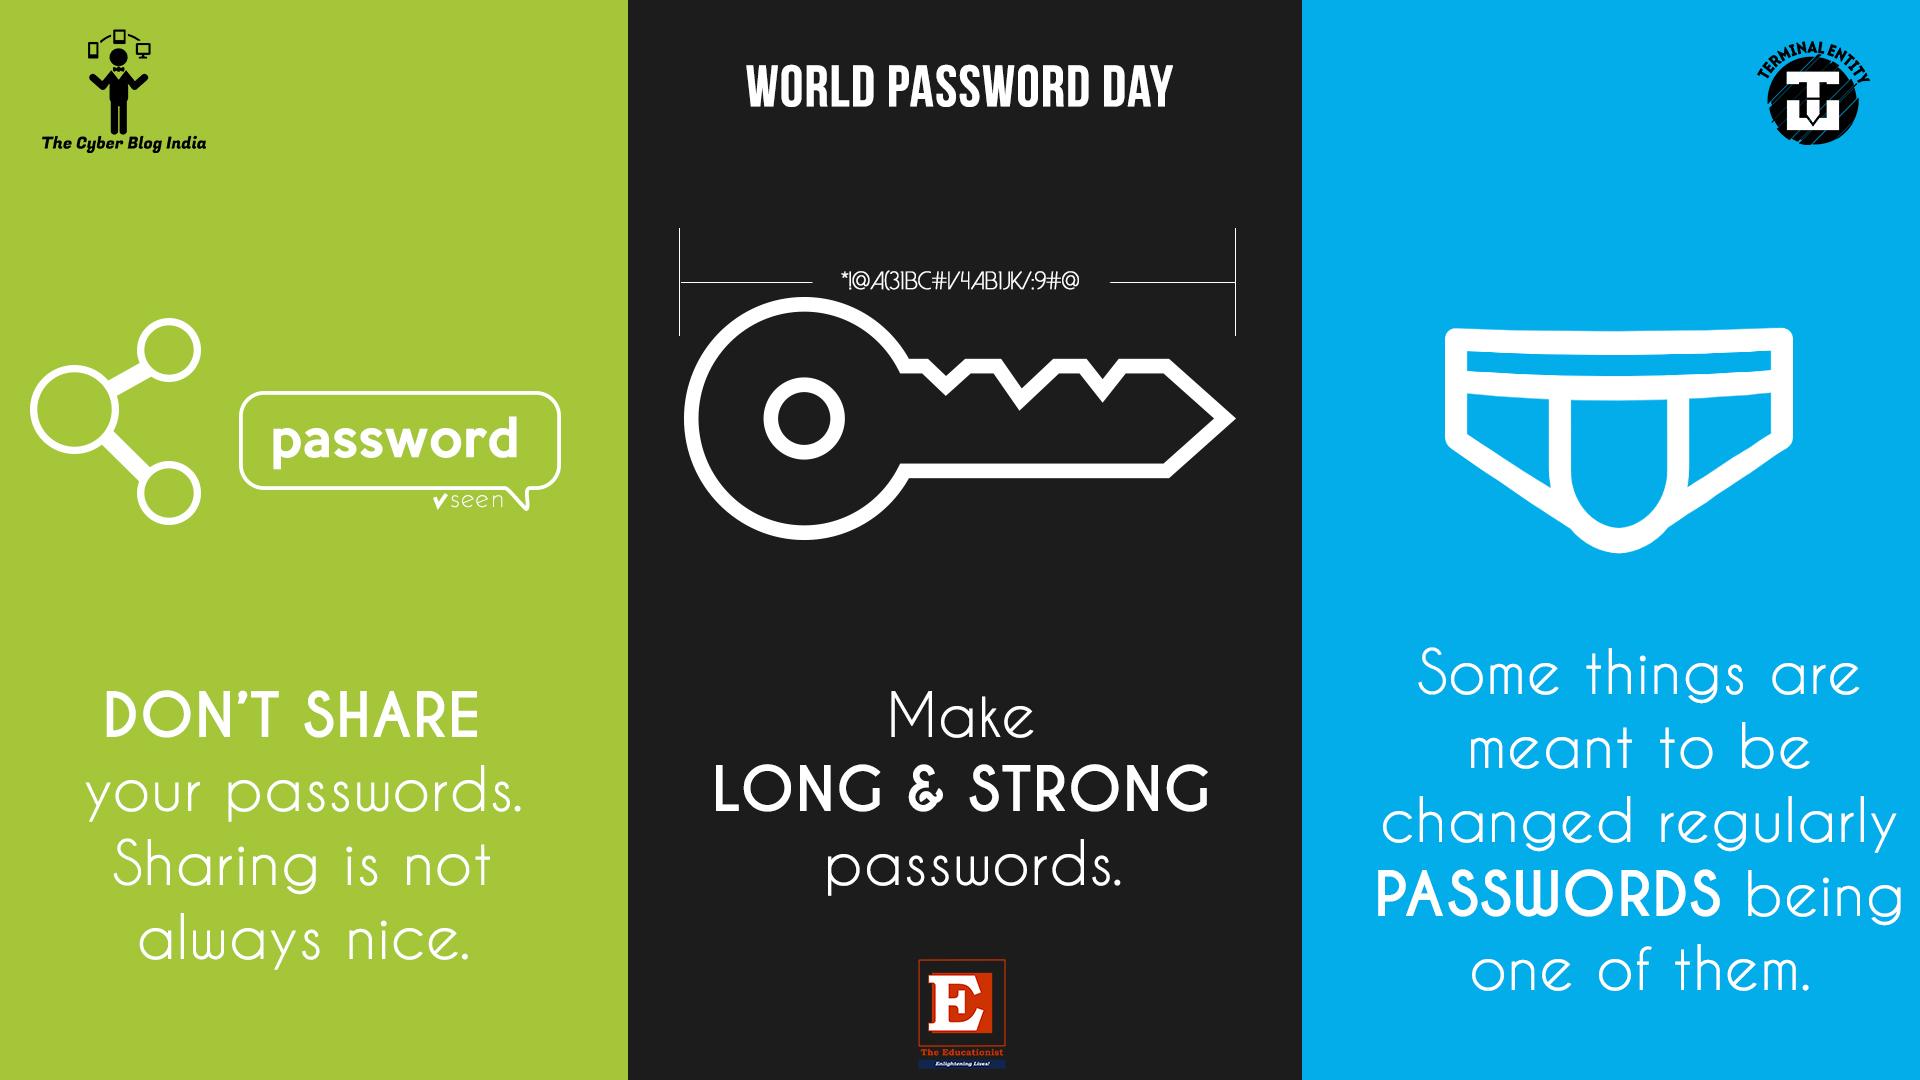 Password Day wallpaper